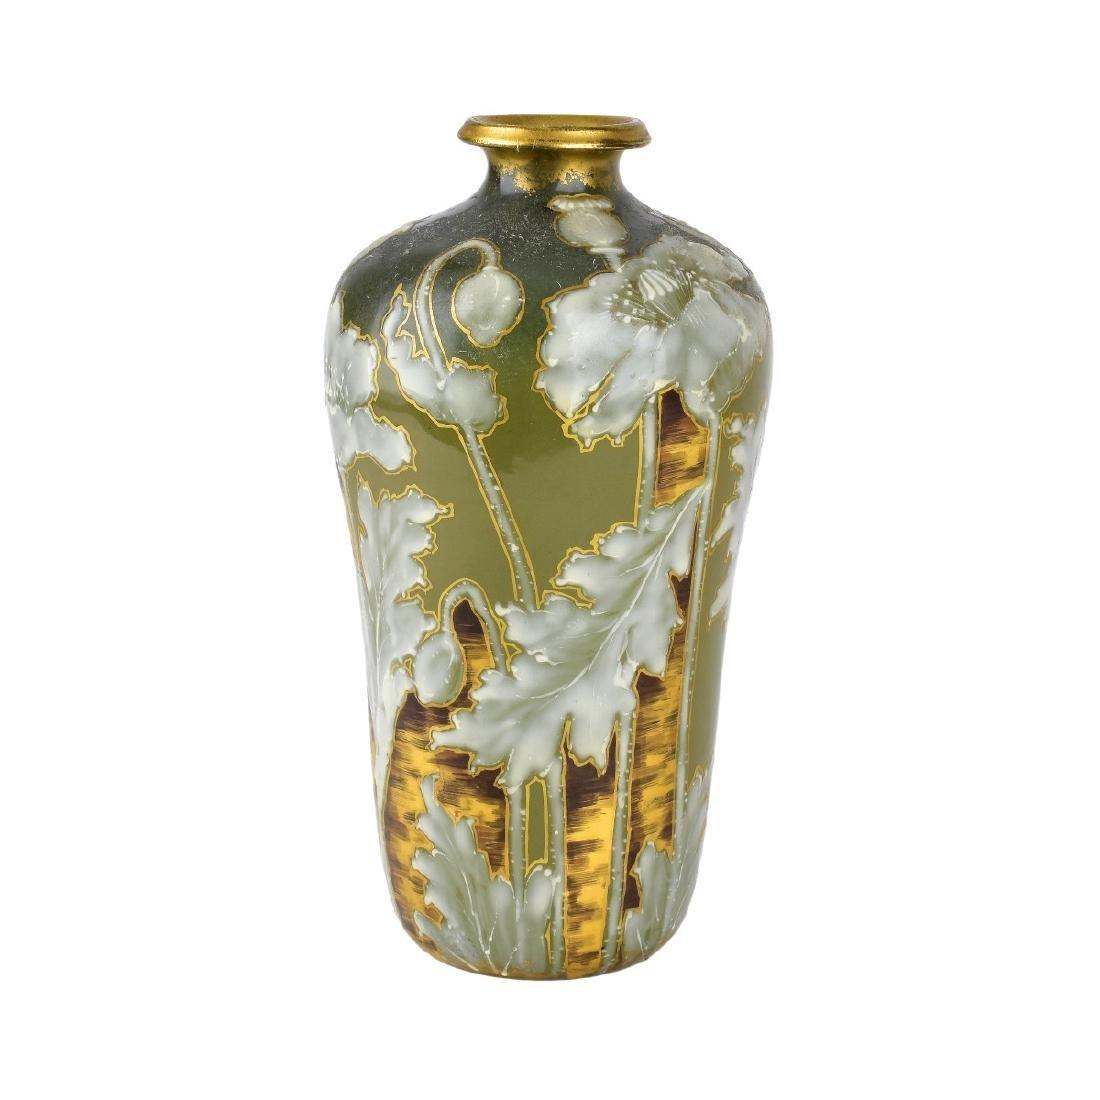 Turn Teplitz Amphora Pottery Vase